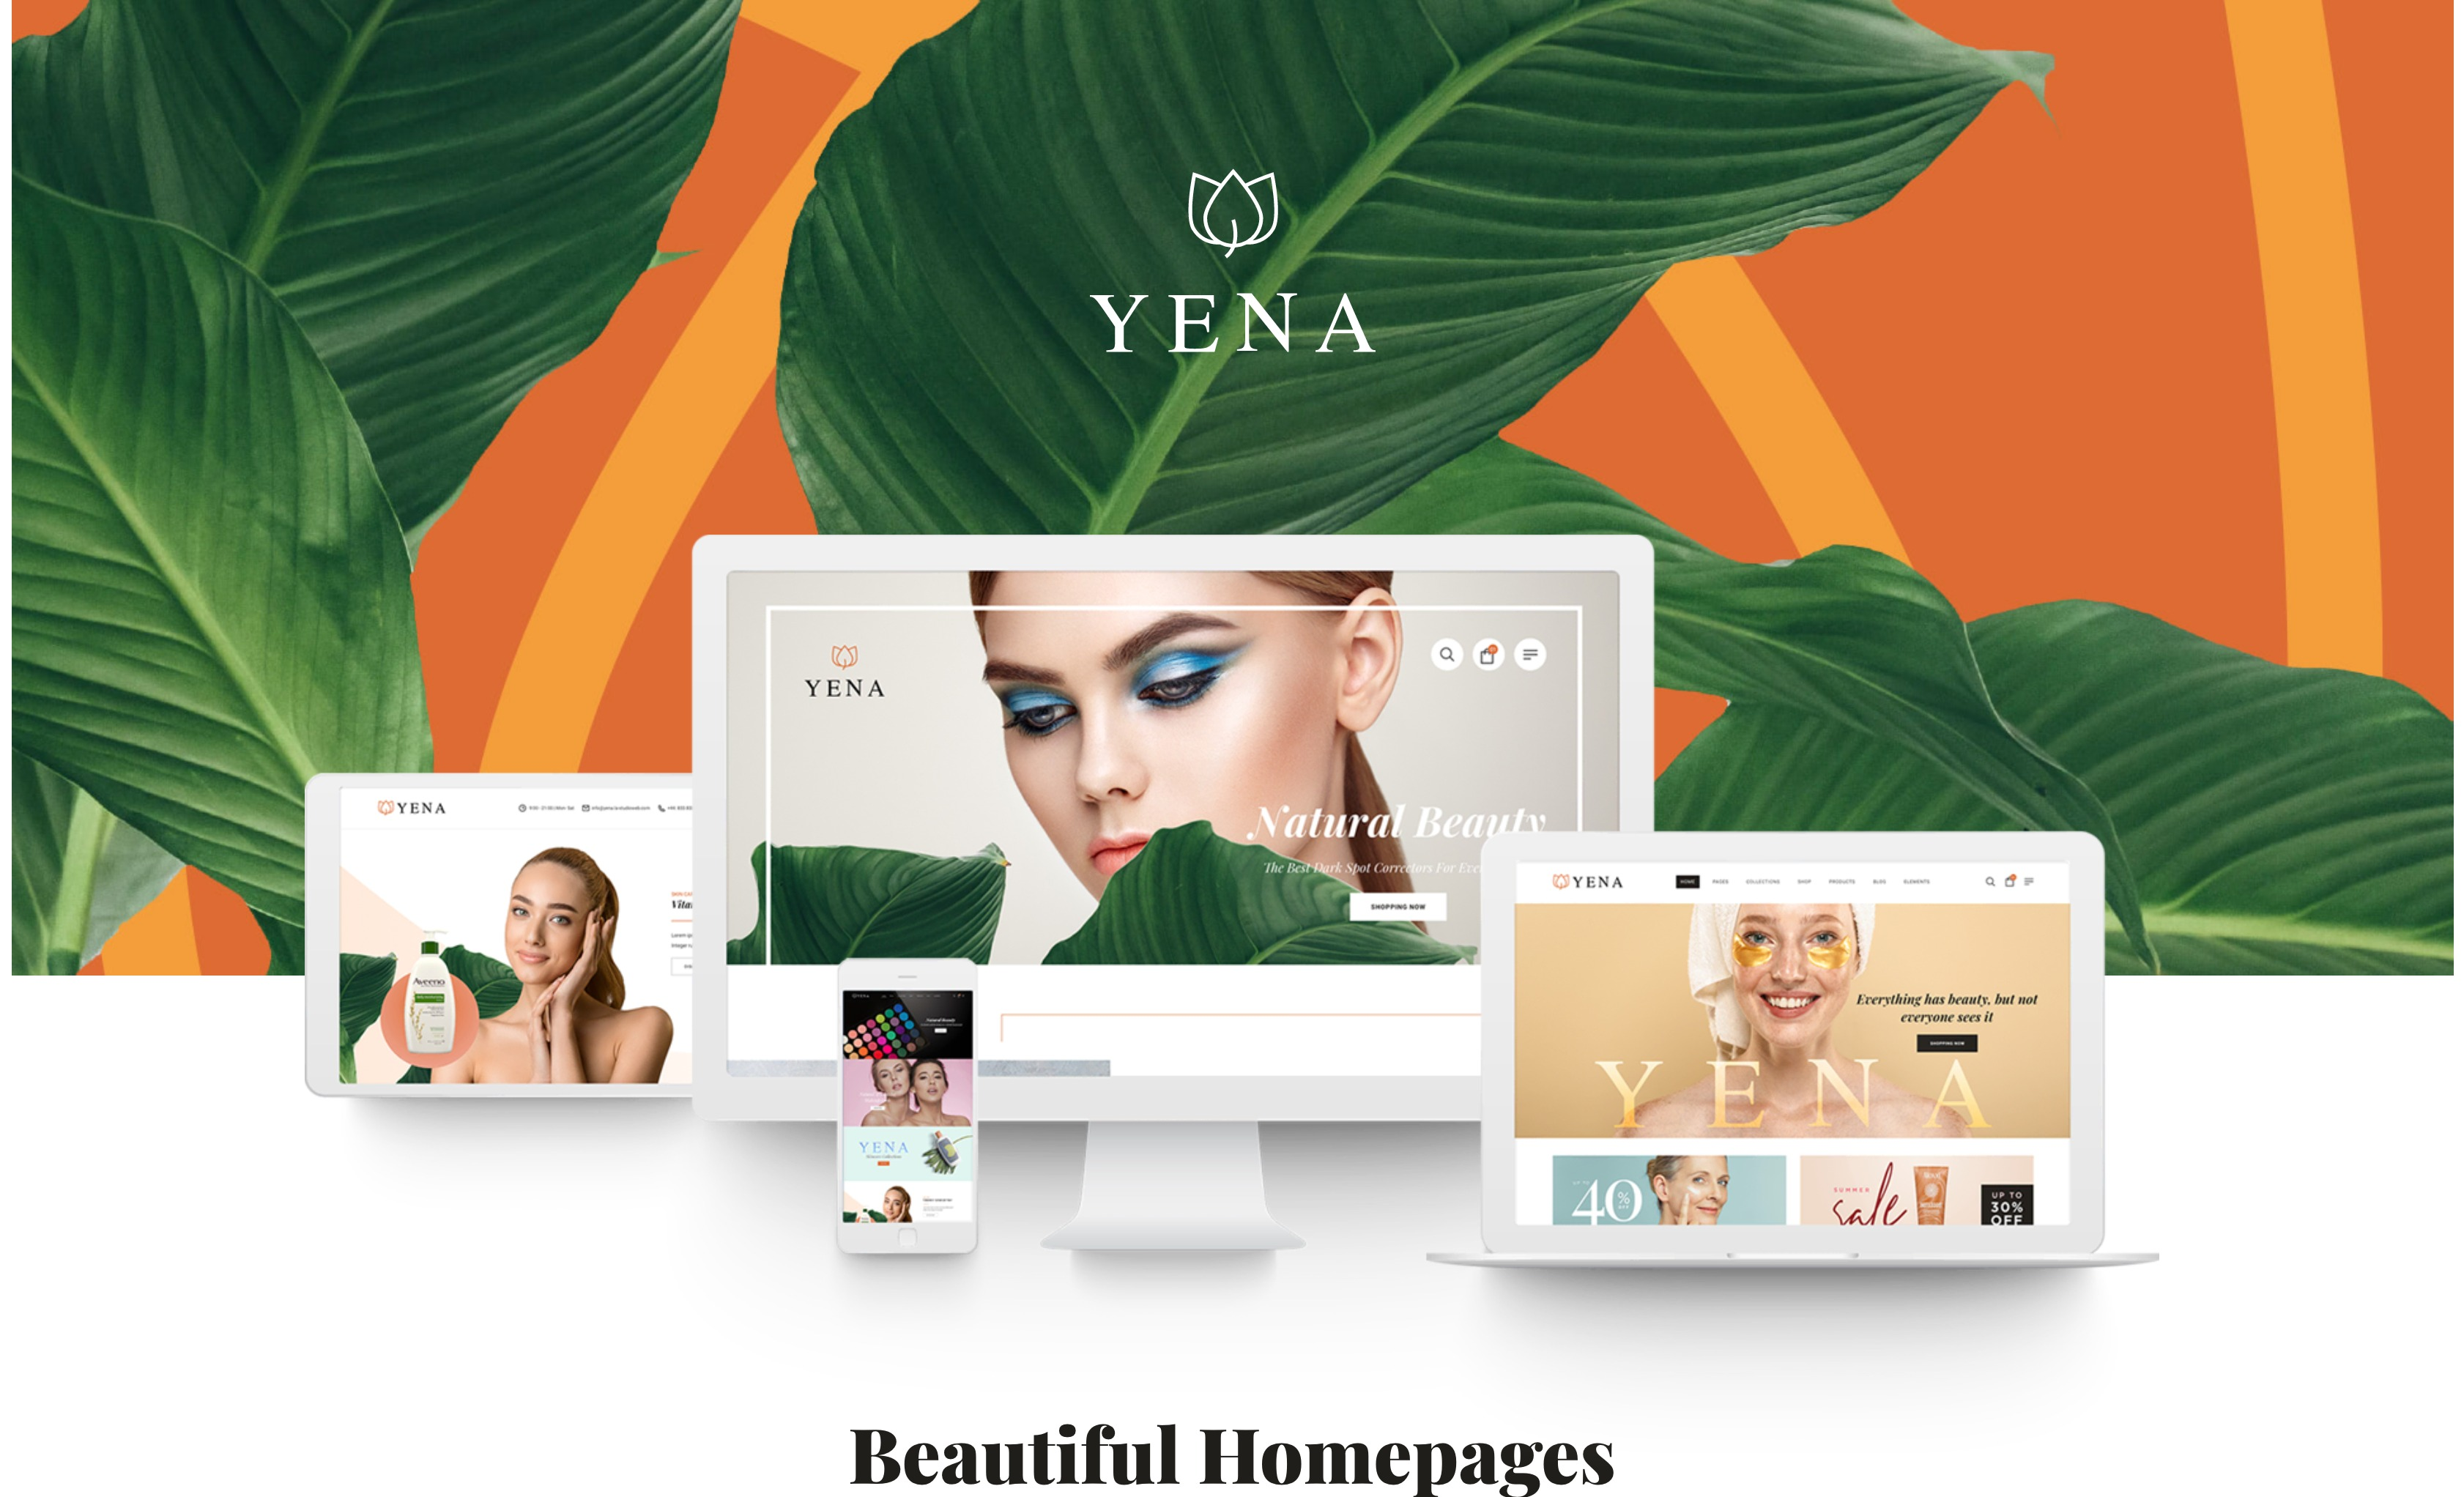 Yena-美容护肤化妆品商城WordPress主题